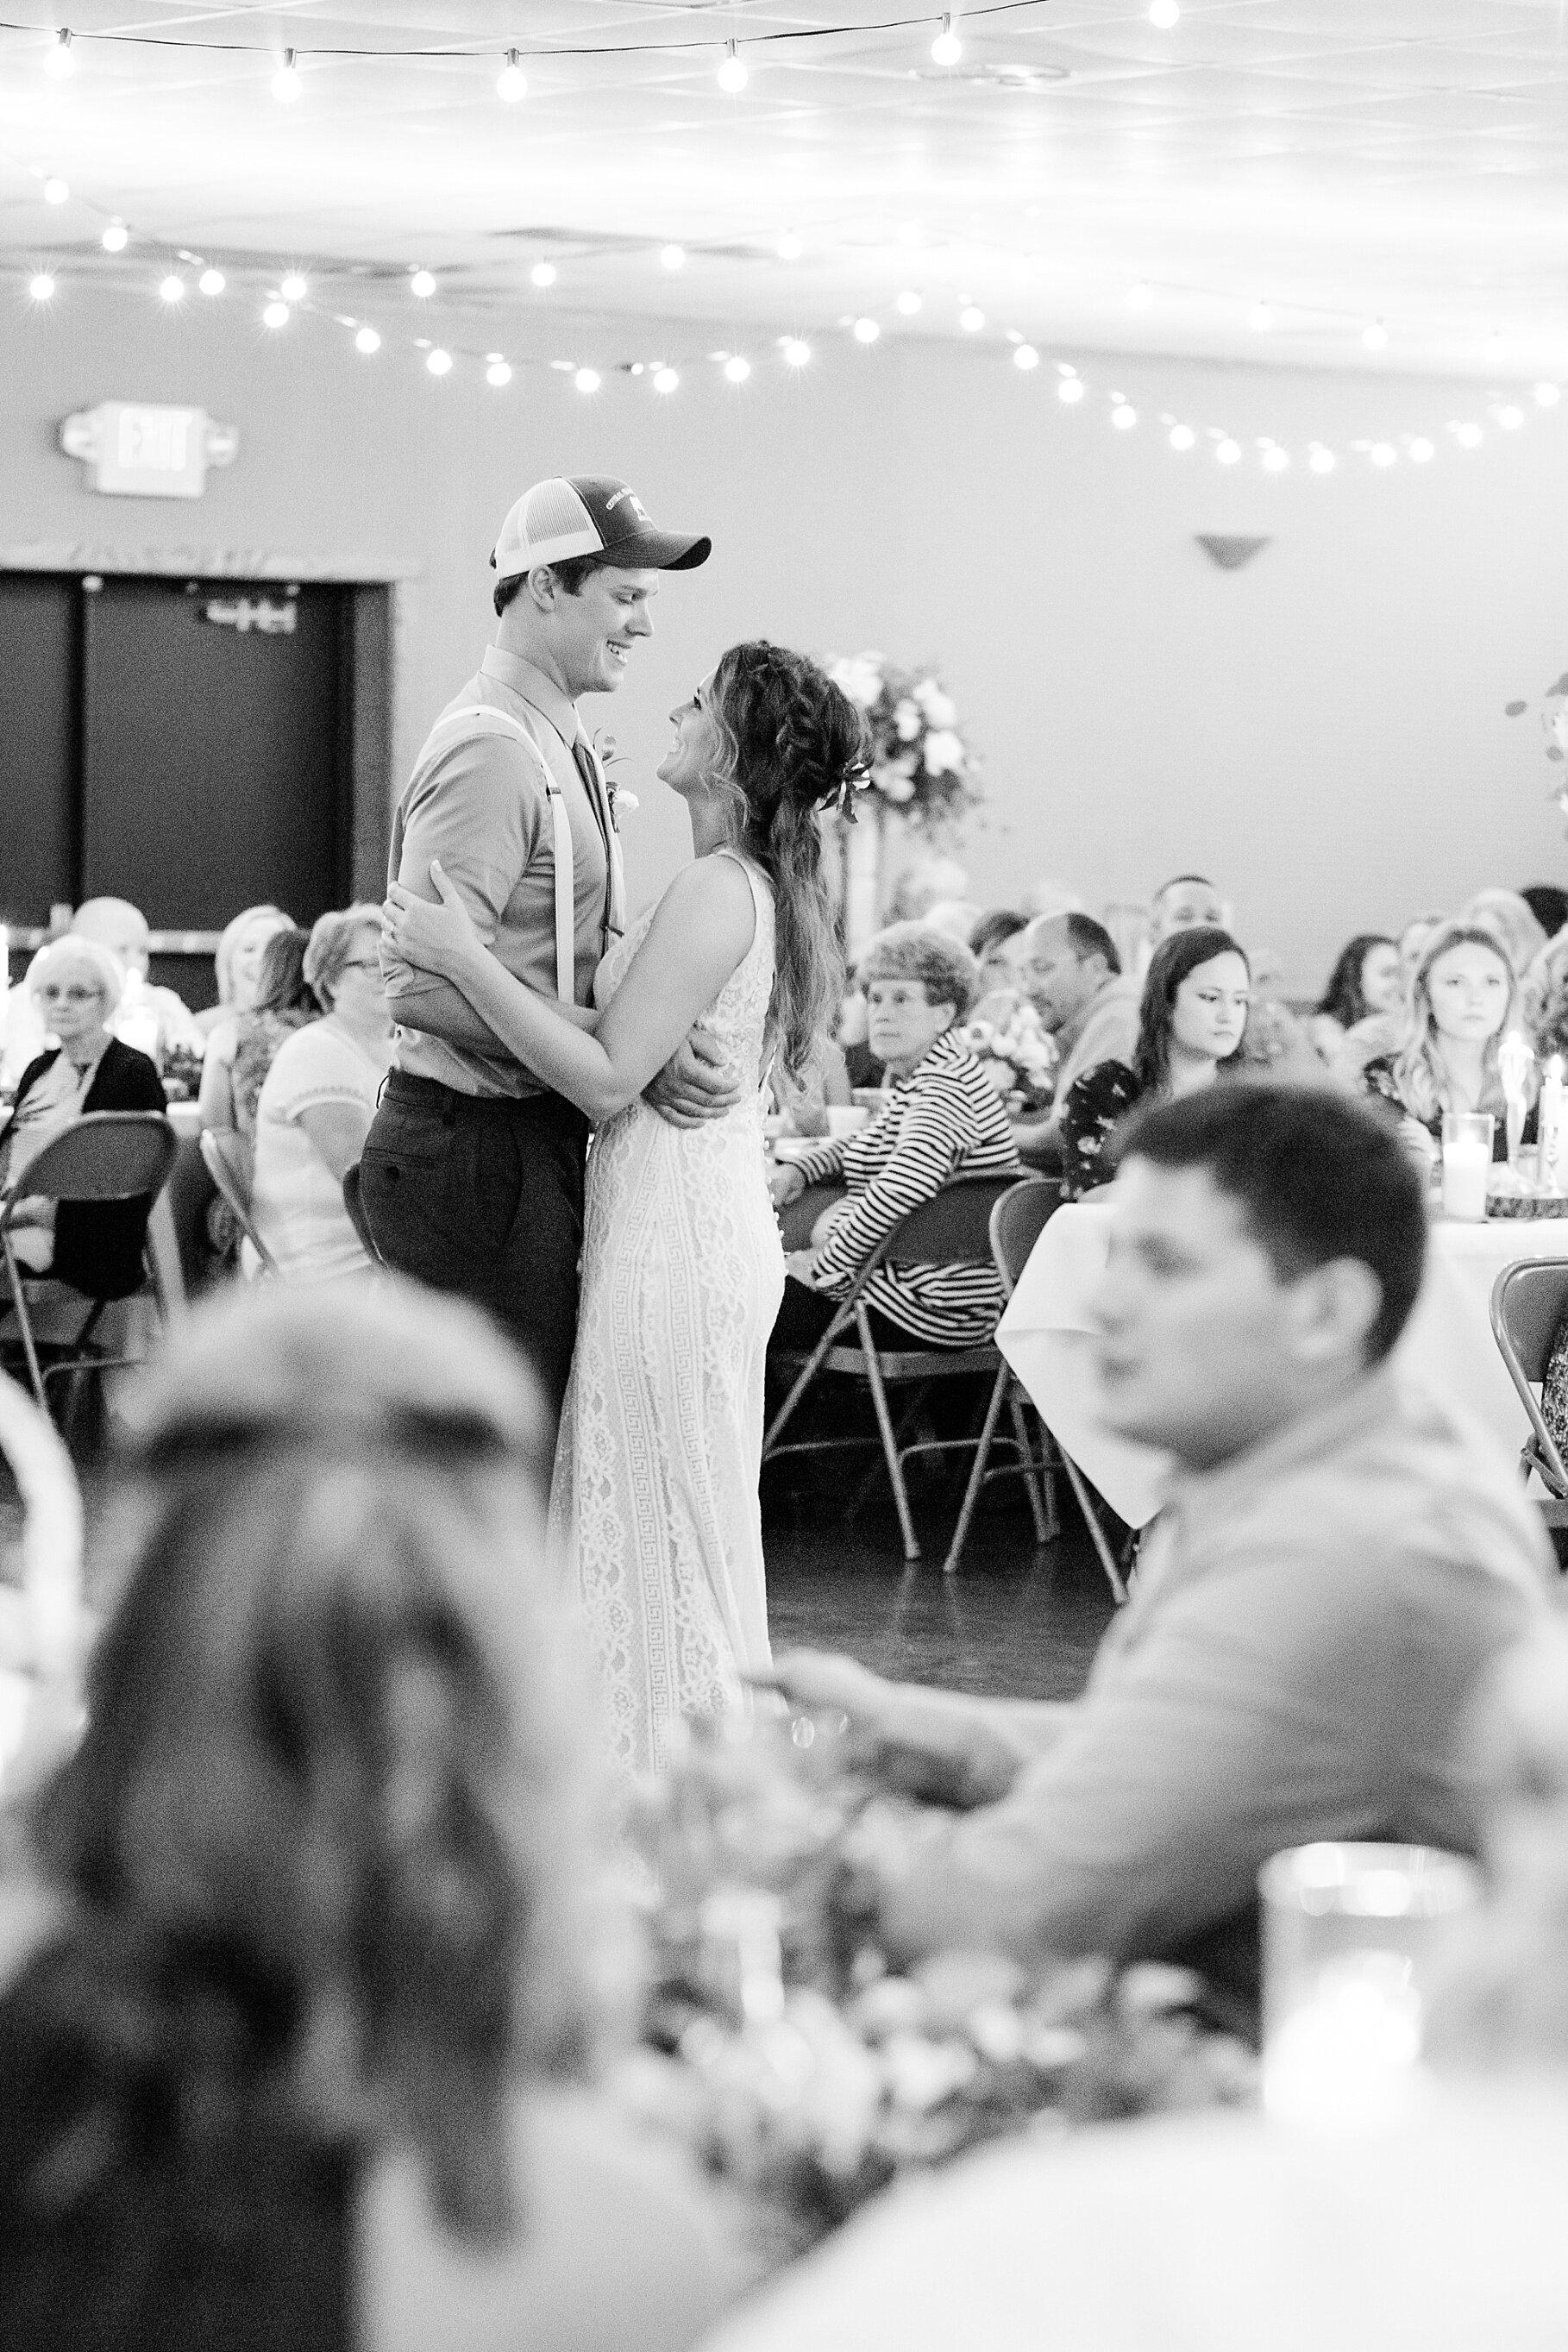 Earth-Toned Wedding by KKP Associate Wedding Photographer and Kelsi Kliethermes Photography Best Columbia Missouri Wedding Photographer_0042.jpg